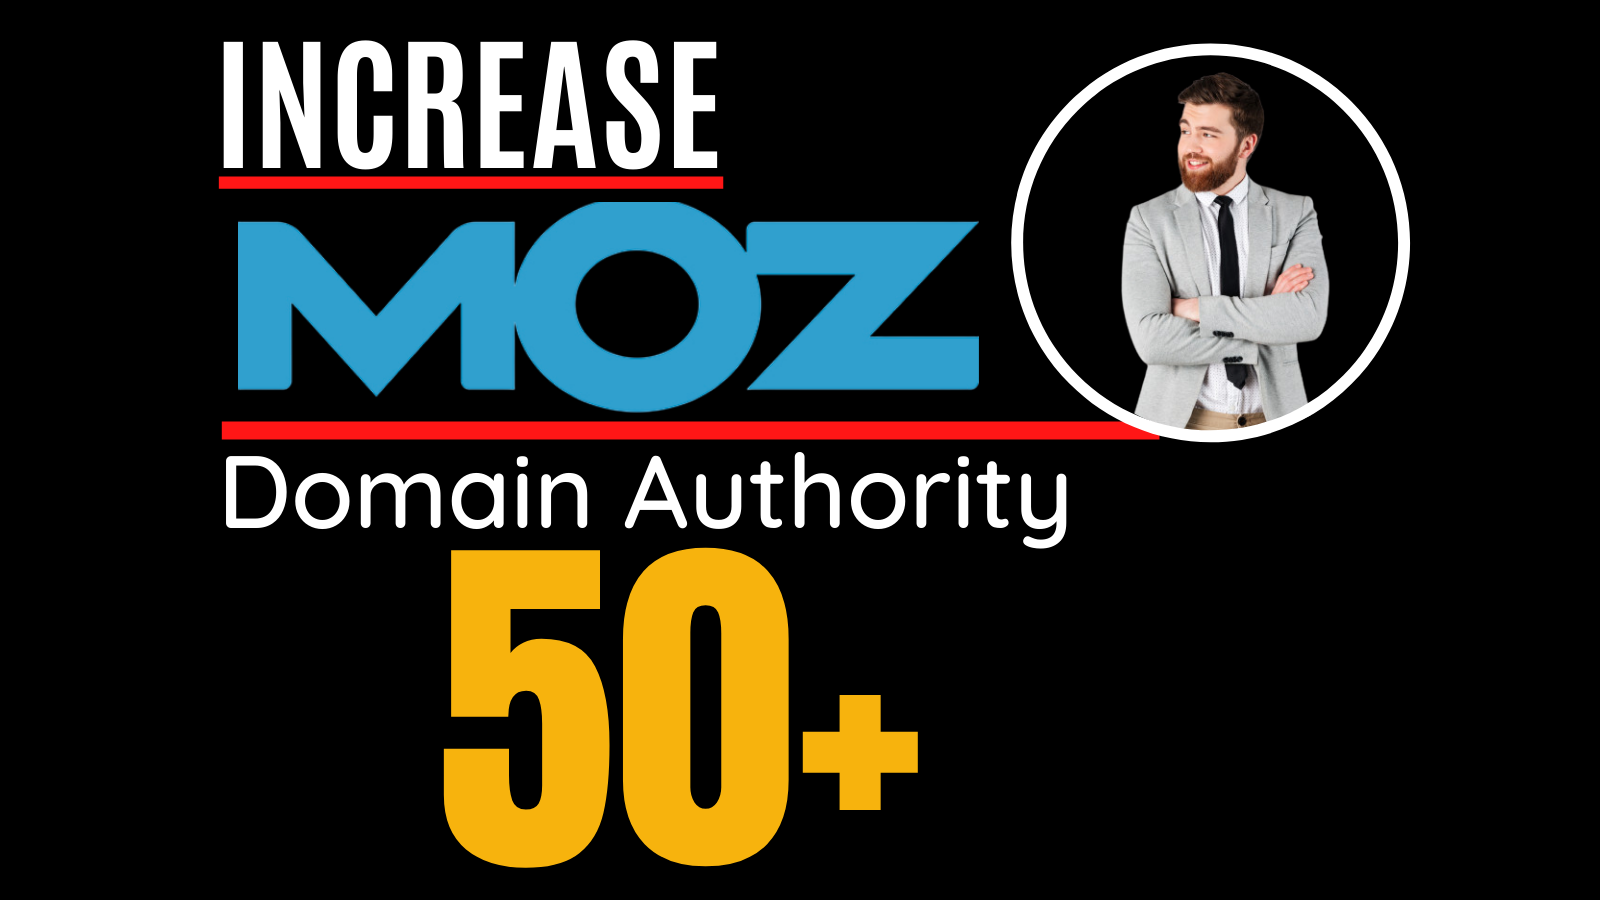 I will increase moz domain authority,  increase moz da 0 to 50 plus